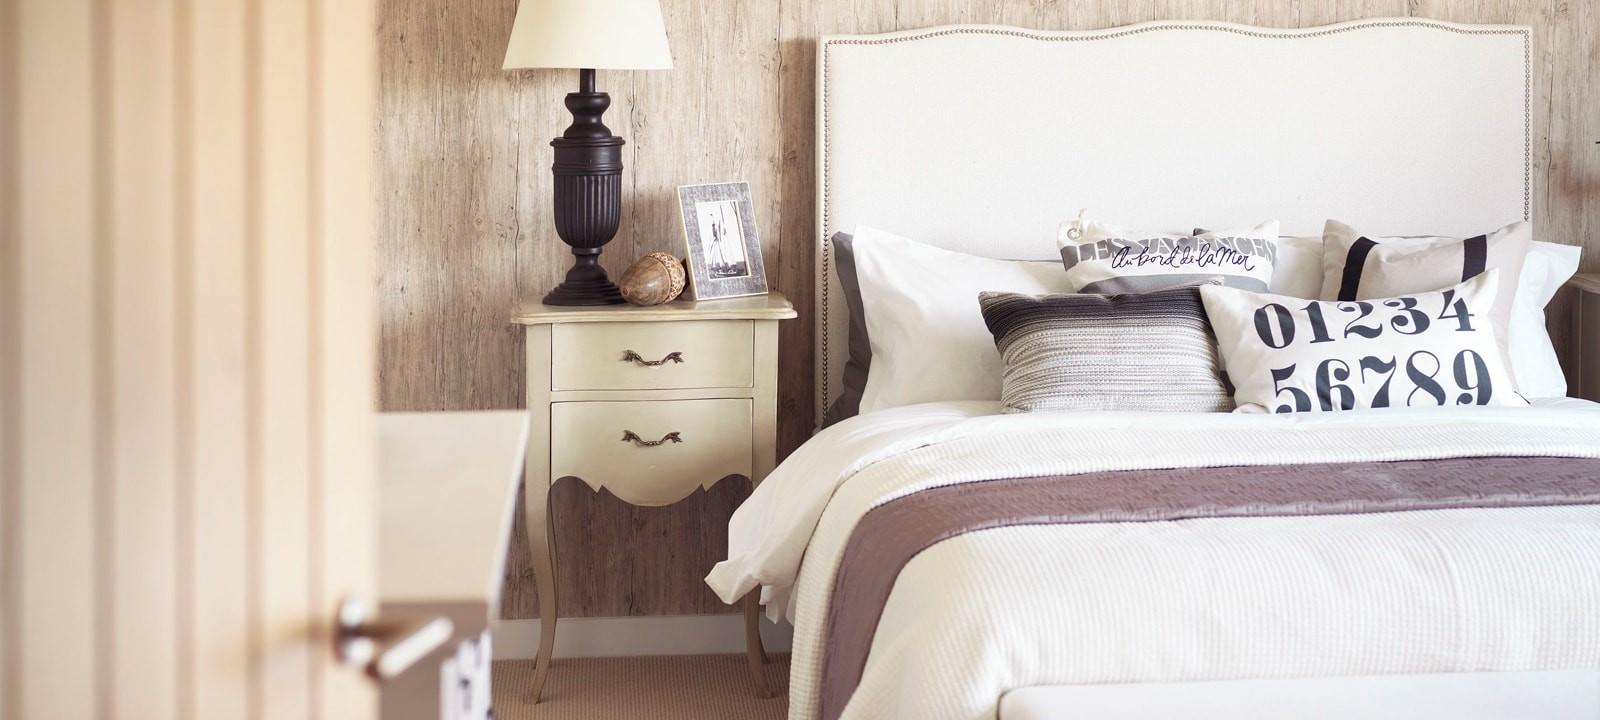 Four Bedroom Coastal Home Bedroom